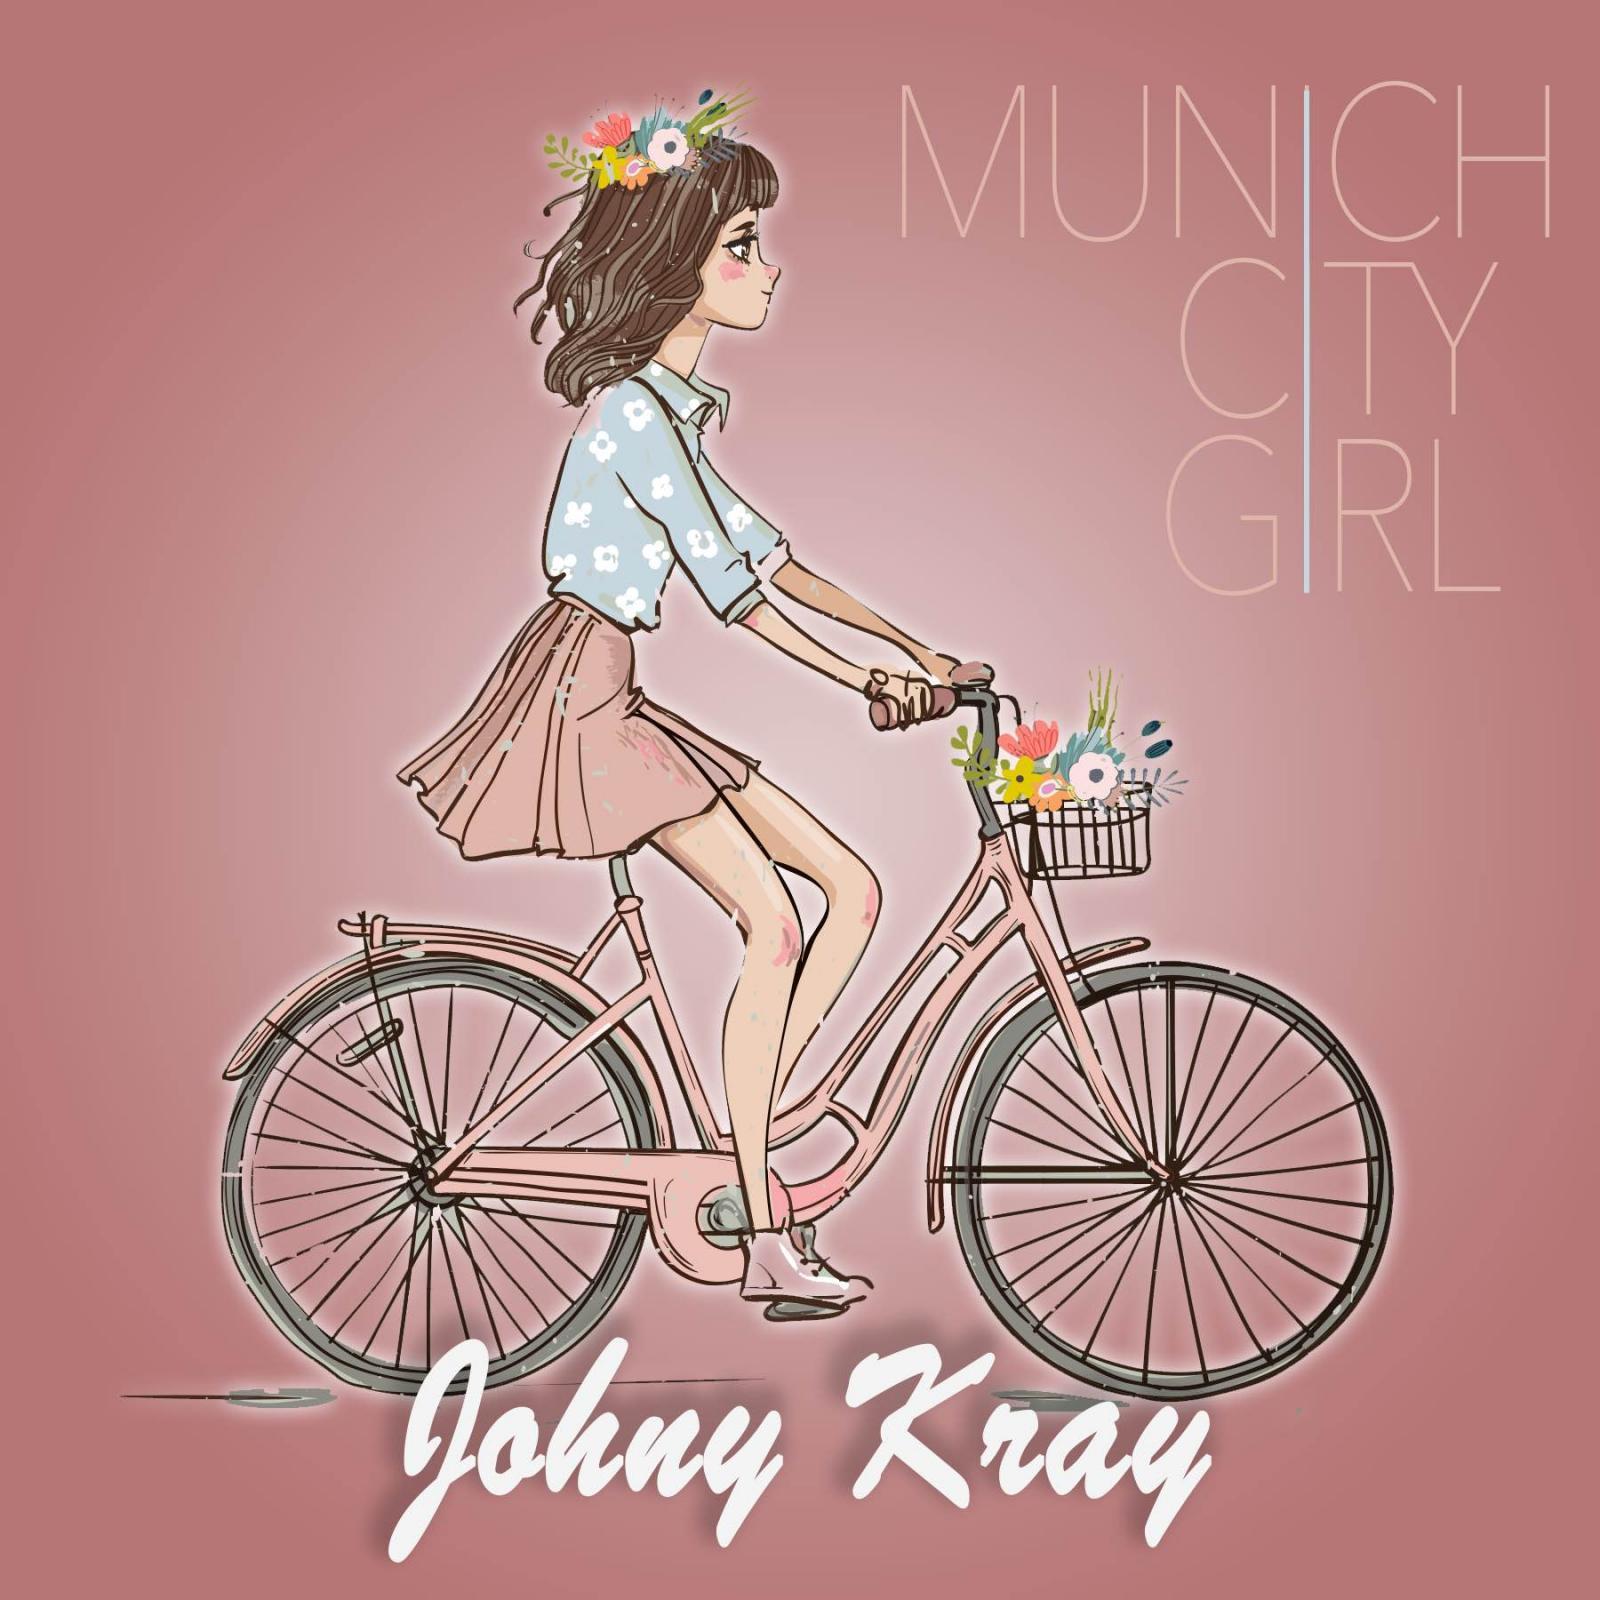 Upcoming: Johny Kray - Munich City Girl